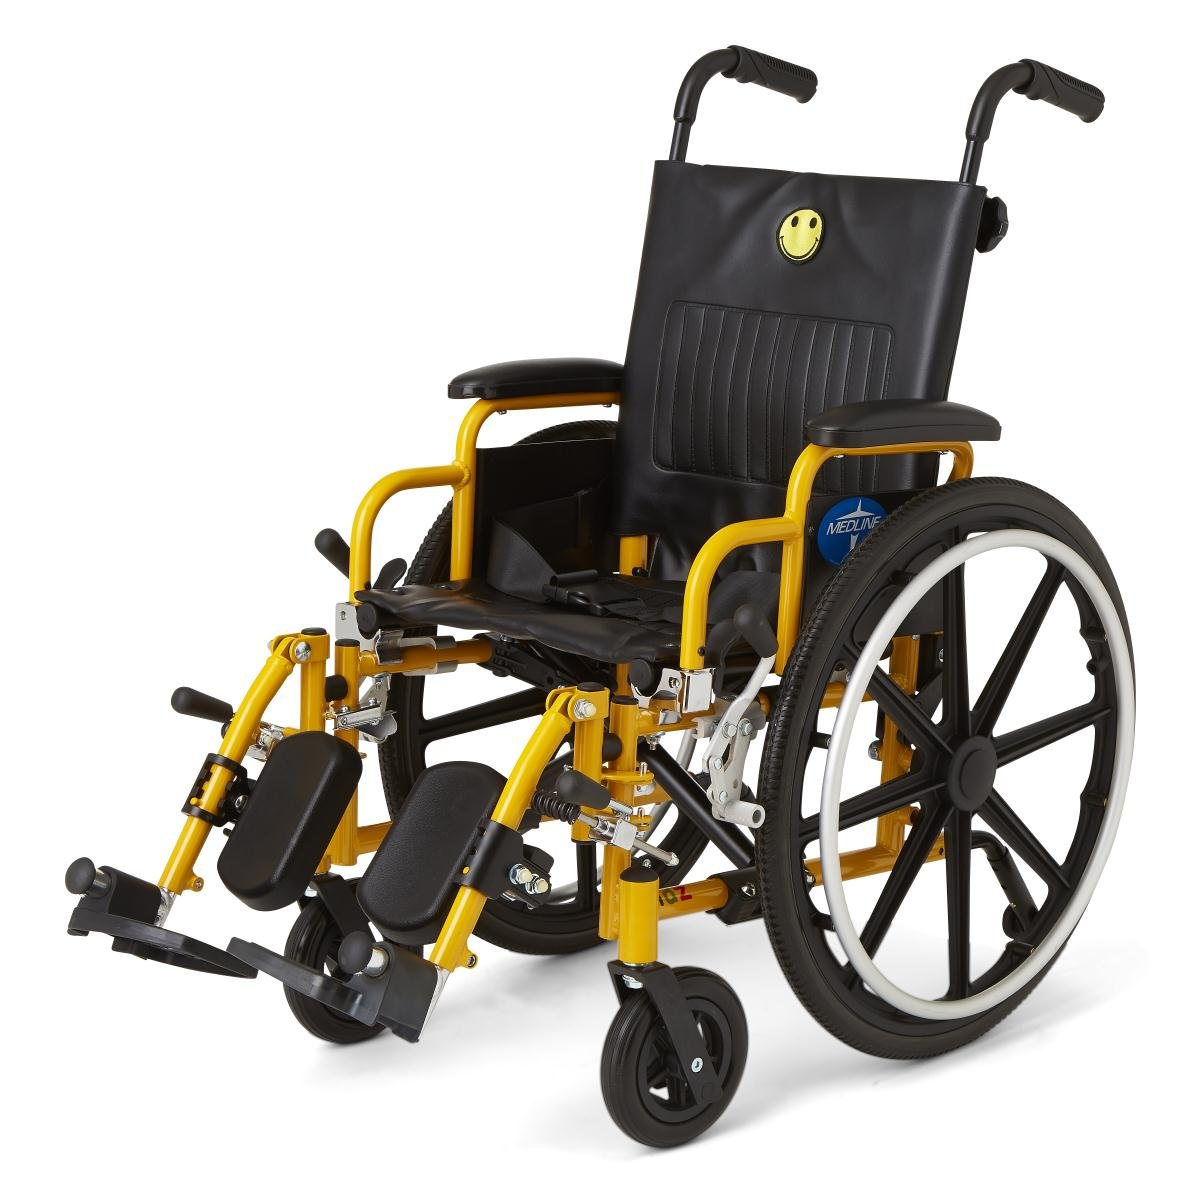 PEDIATRIC/CHILD WHEELCHAIR WHEEL CHAIR SEAT - 14'' Seat Elevating Leg Rests